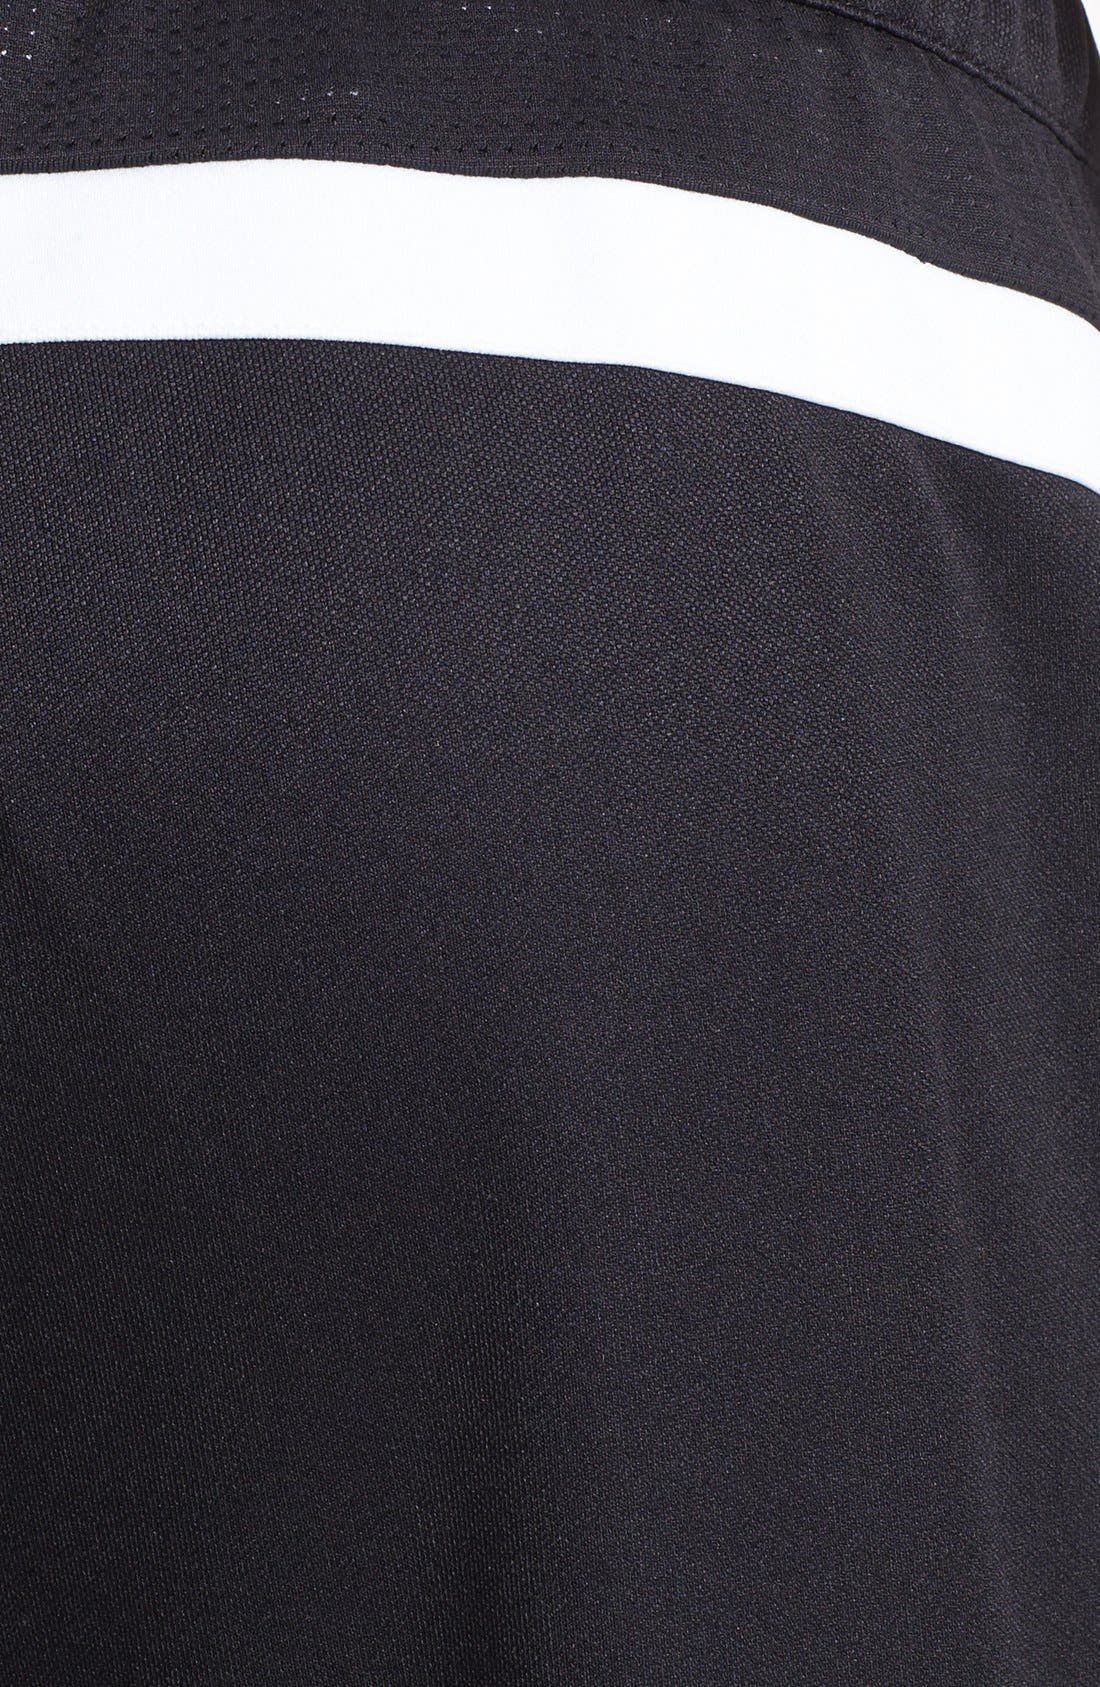 ADIDAS,                             'Tiro 13' Slim Fit Training Pants,                             Alternate thumbnail 5, color,                             001